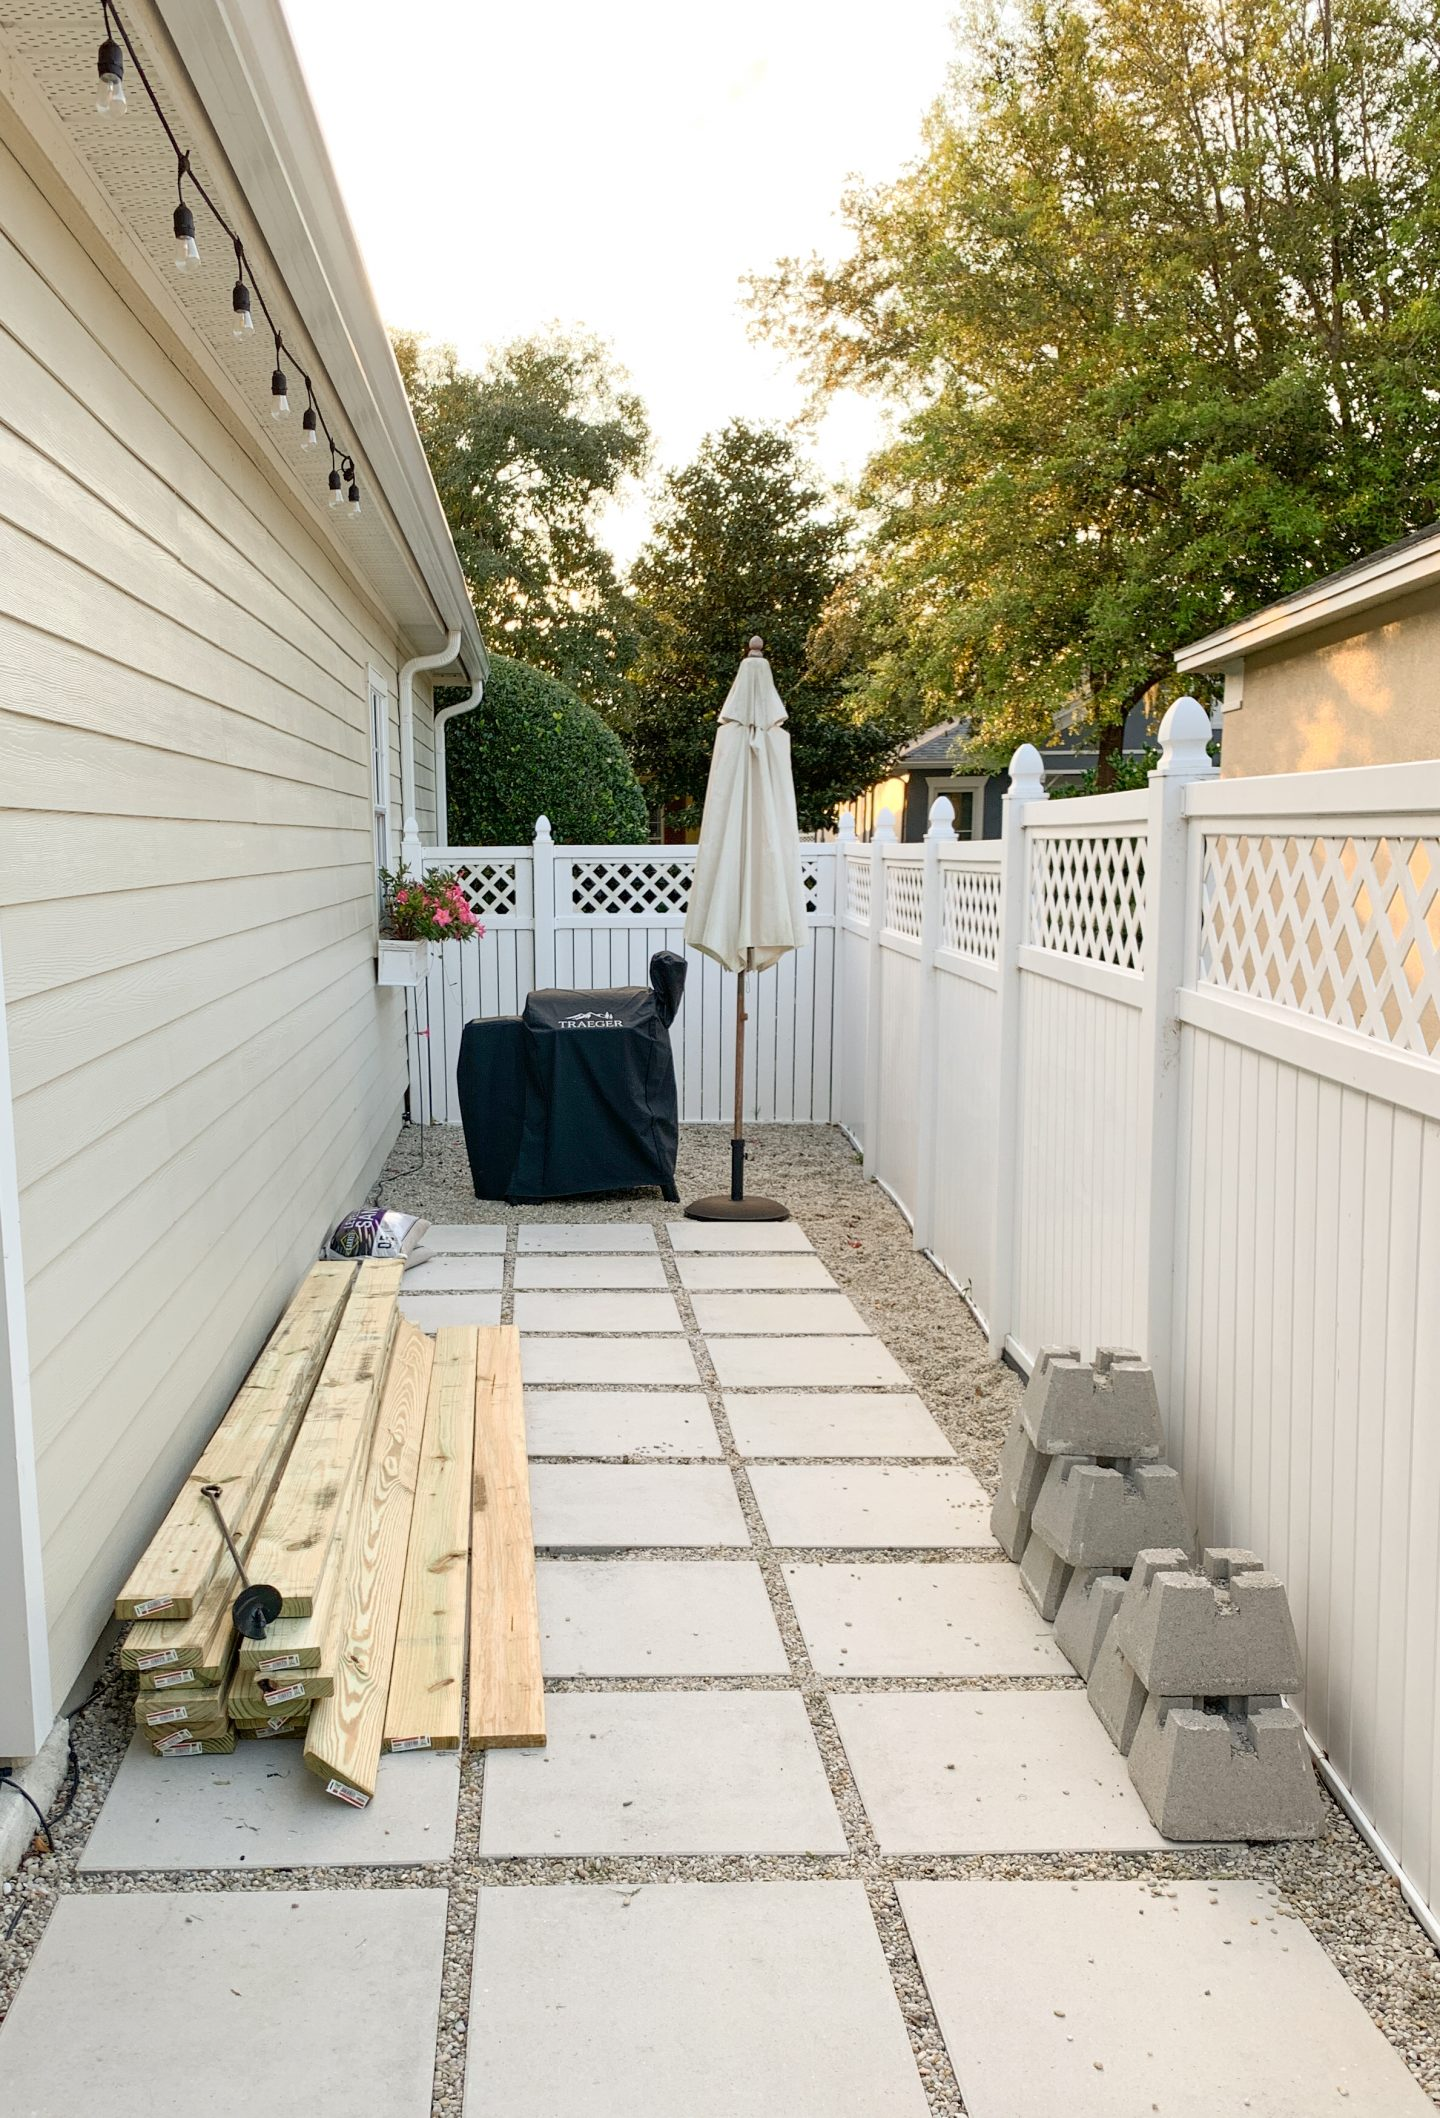 Wood deck area